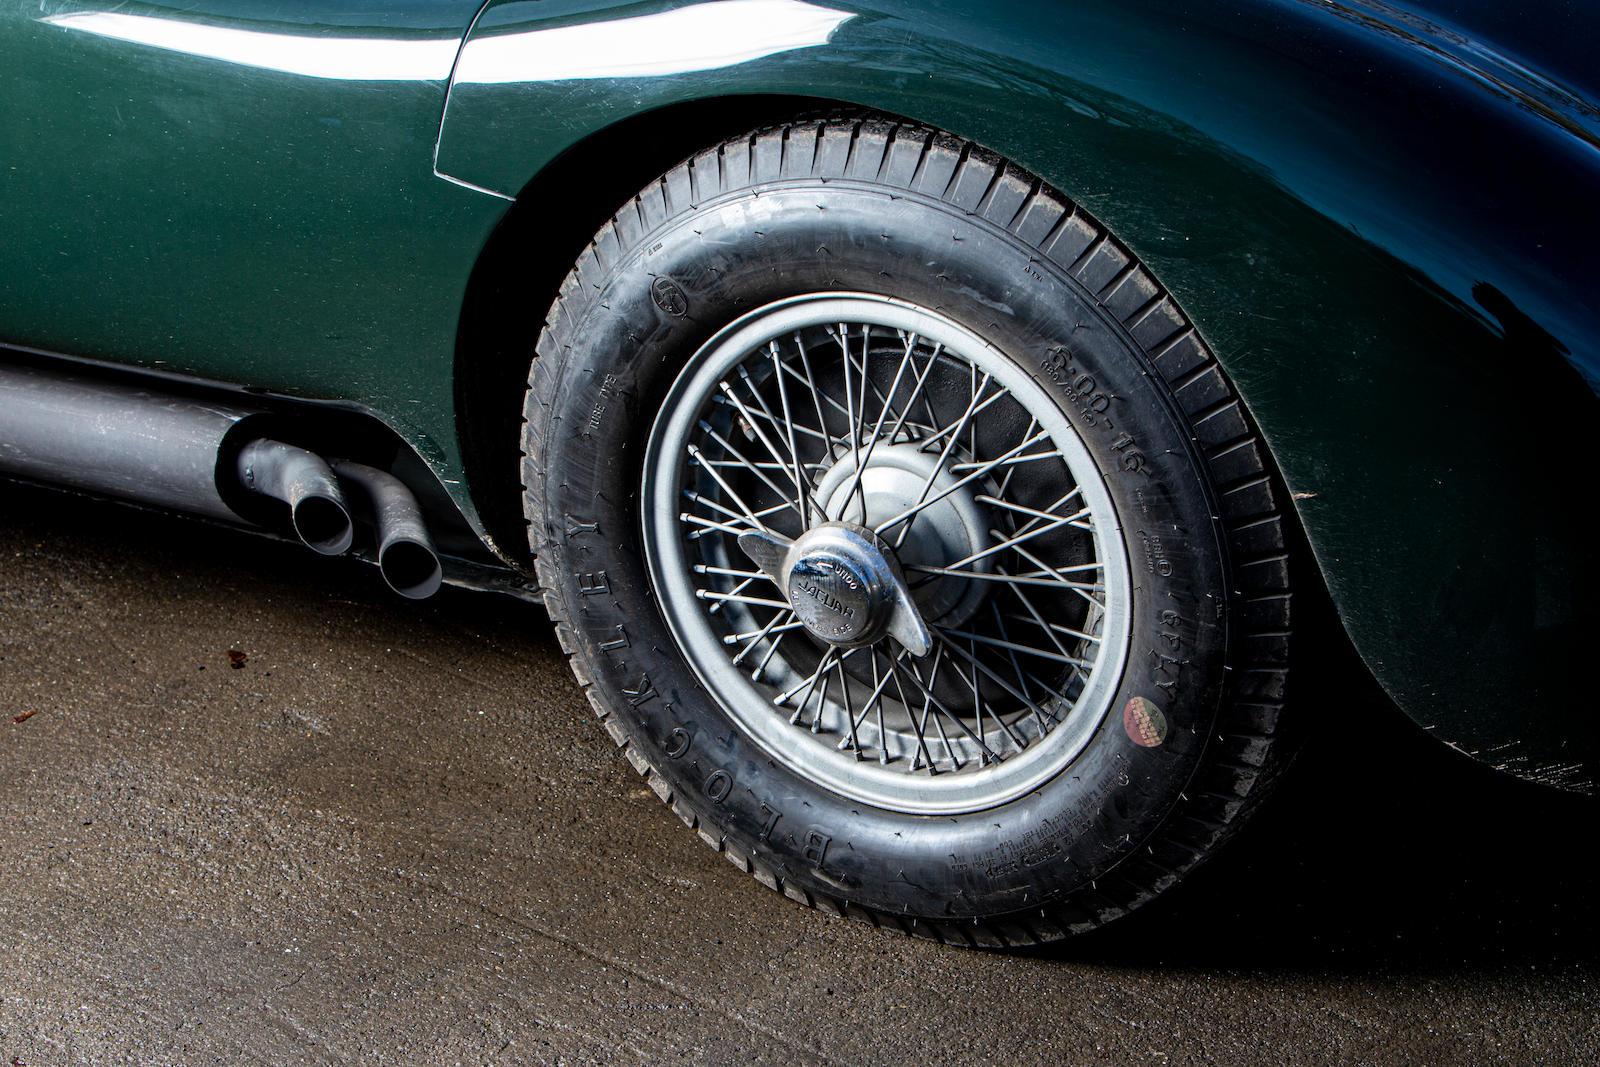 1952 Jaguar XK120 C-Type wheel detail